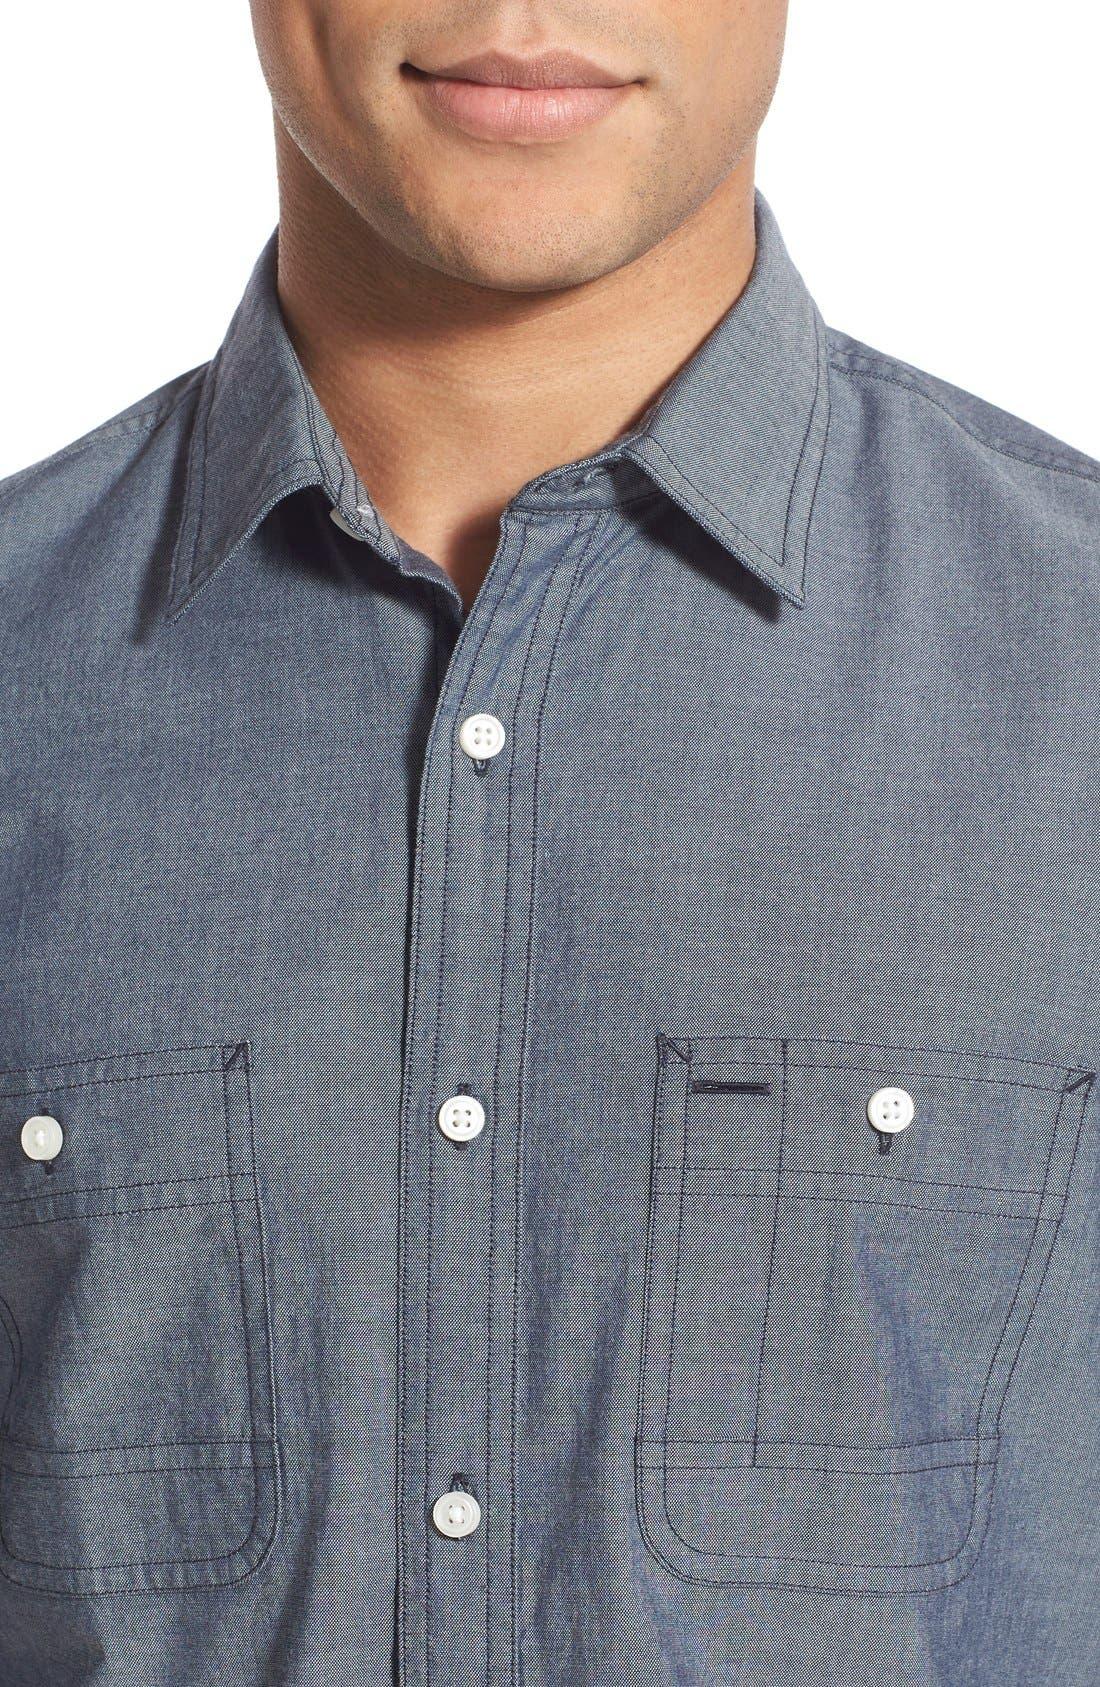 'Workwear' Trim Fit Chambray Sport Shirt,                             Alternate thumbnail 7, color,                             Light Blue